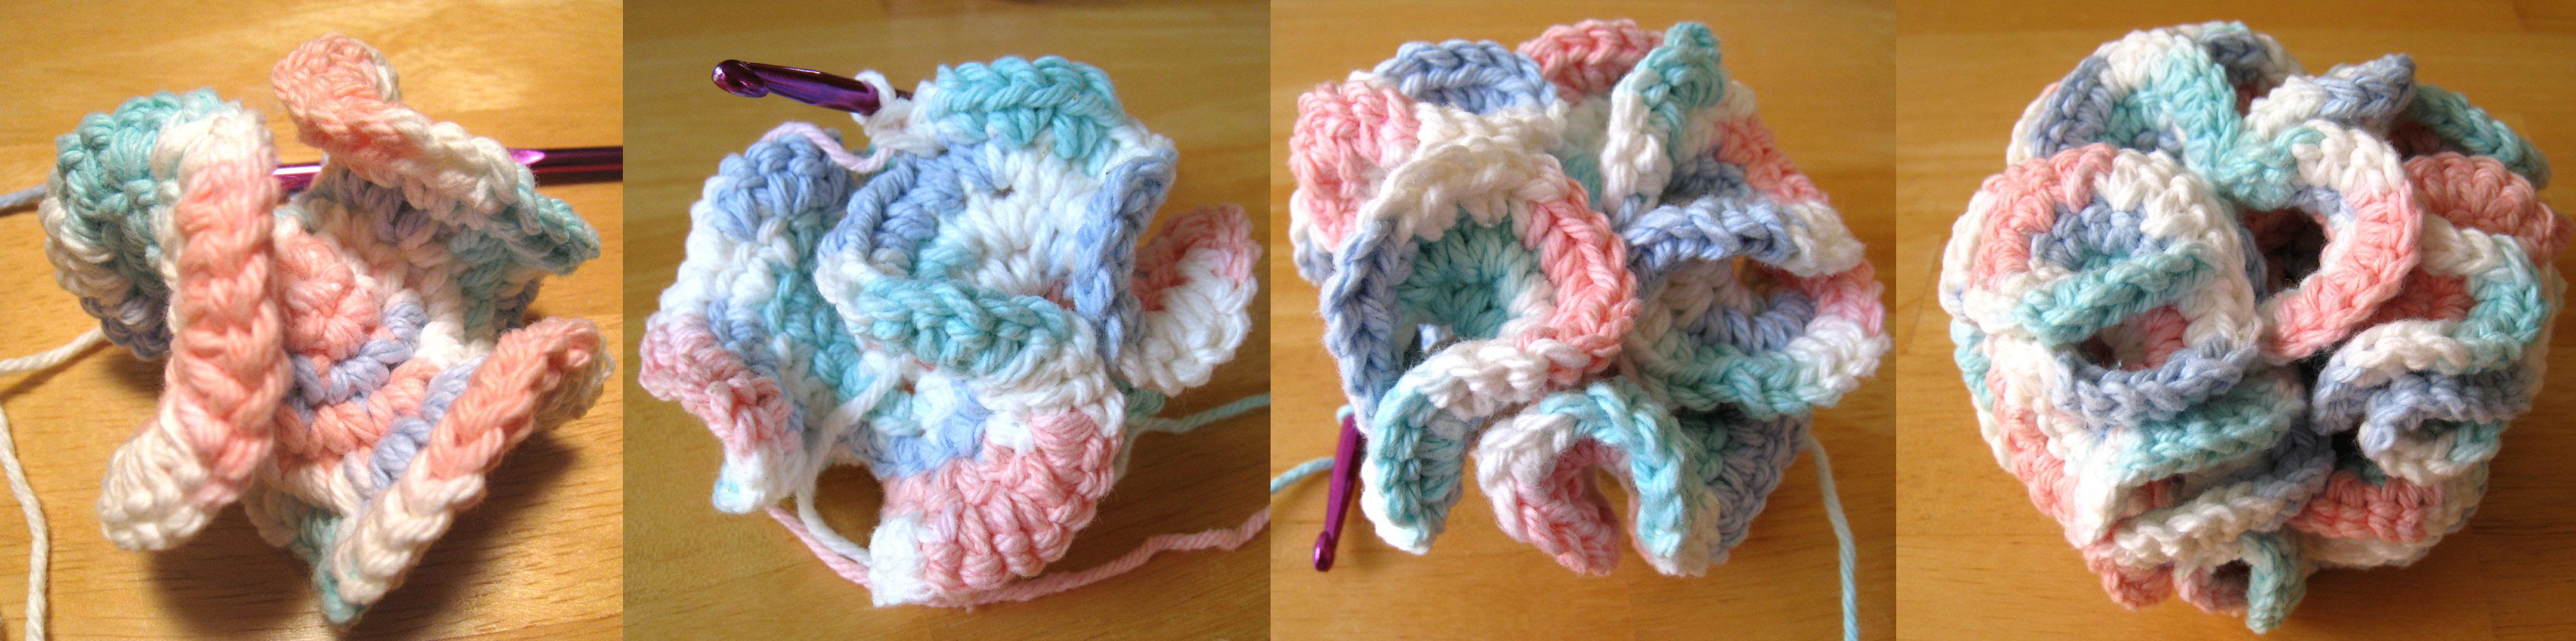 File:Crochet bath puff 6.jpg - Wikimedia Commons